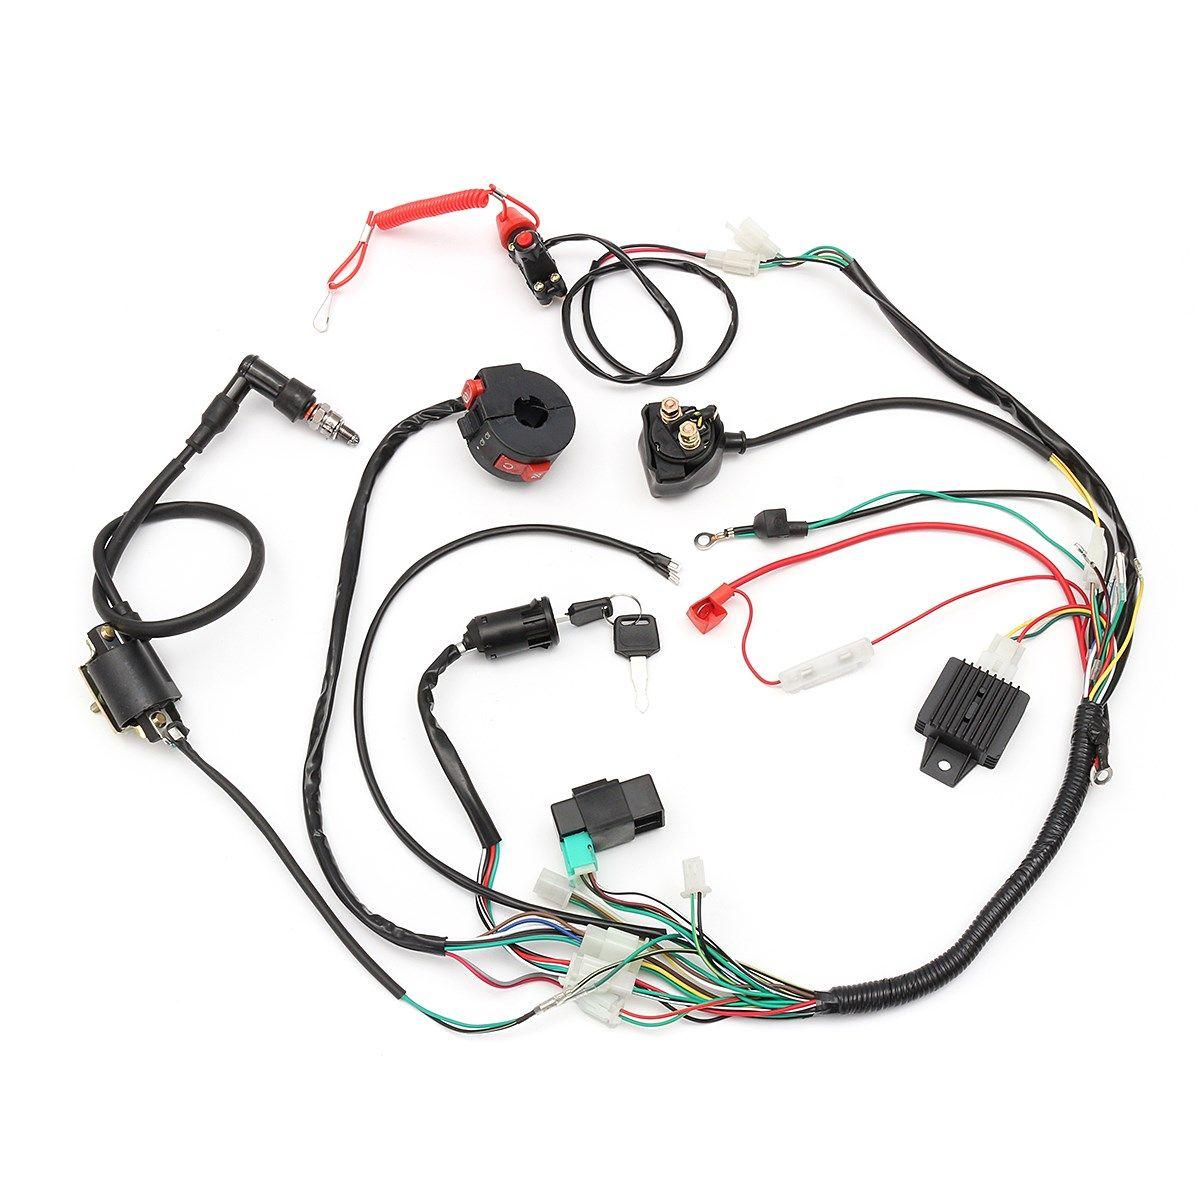 CDI Engine Start Harness Set Wiring Harness Loom Solenoid Coil Rectifier For 50/70/90/110/125CC Quad Dirt Bike ATV Go Kart